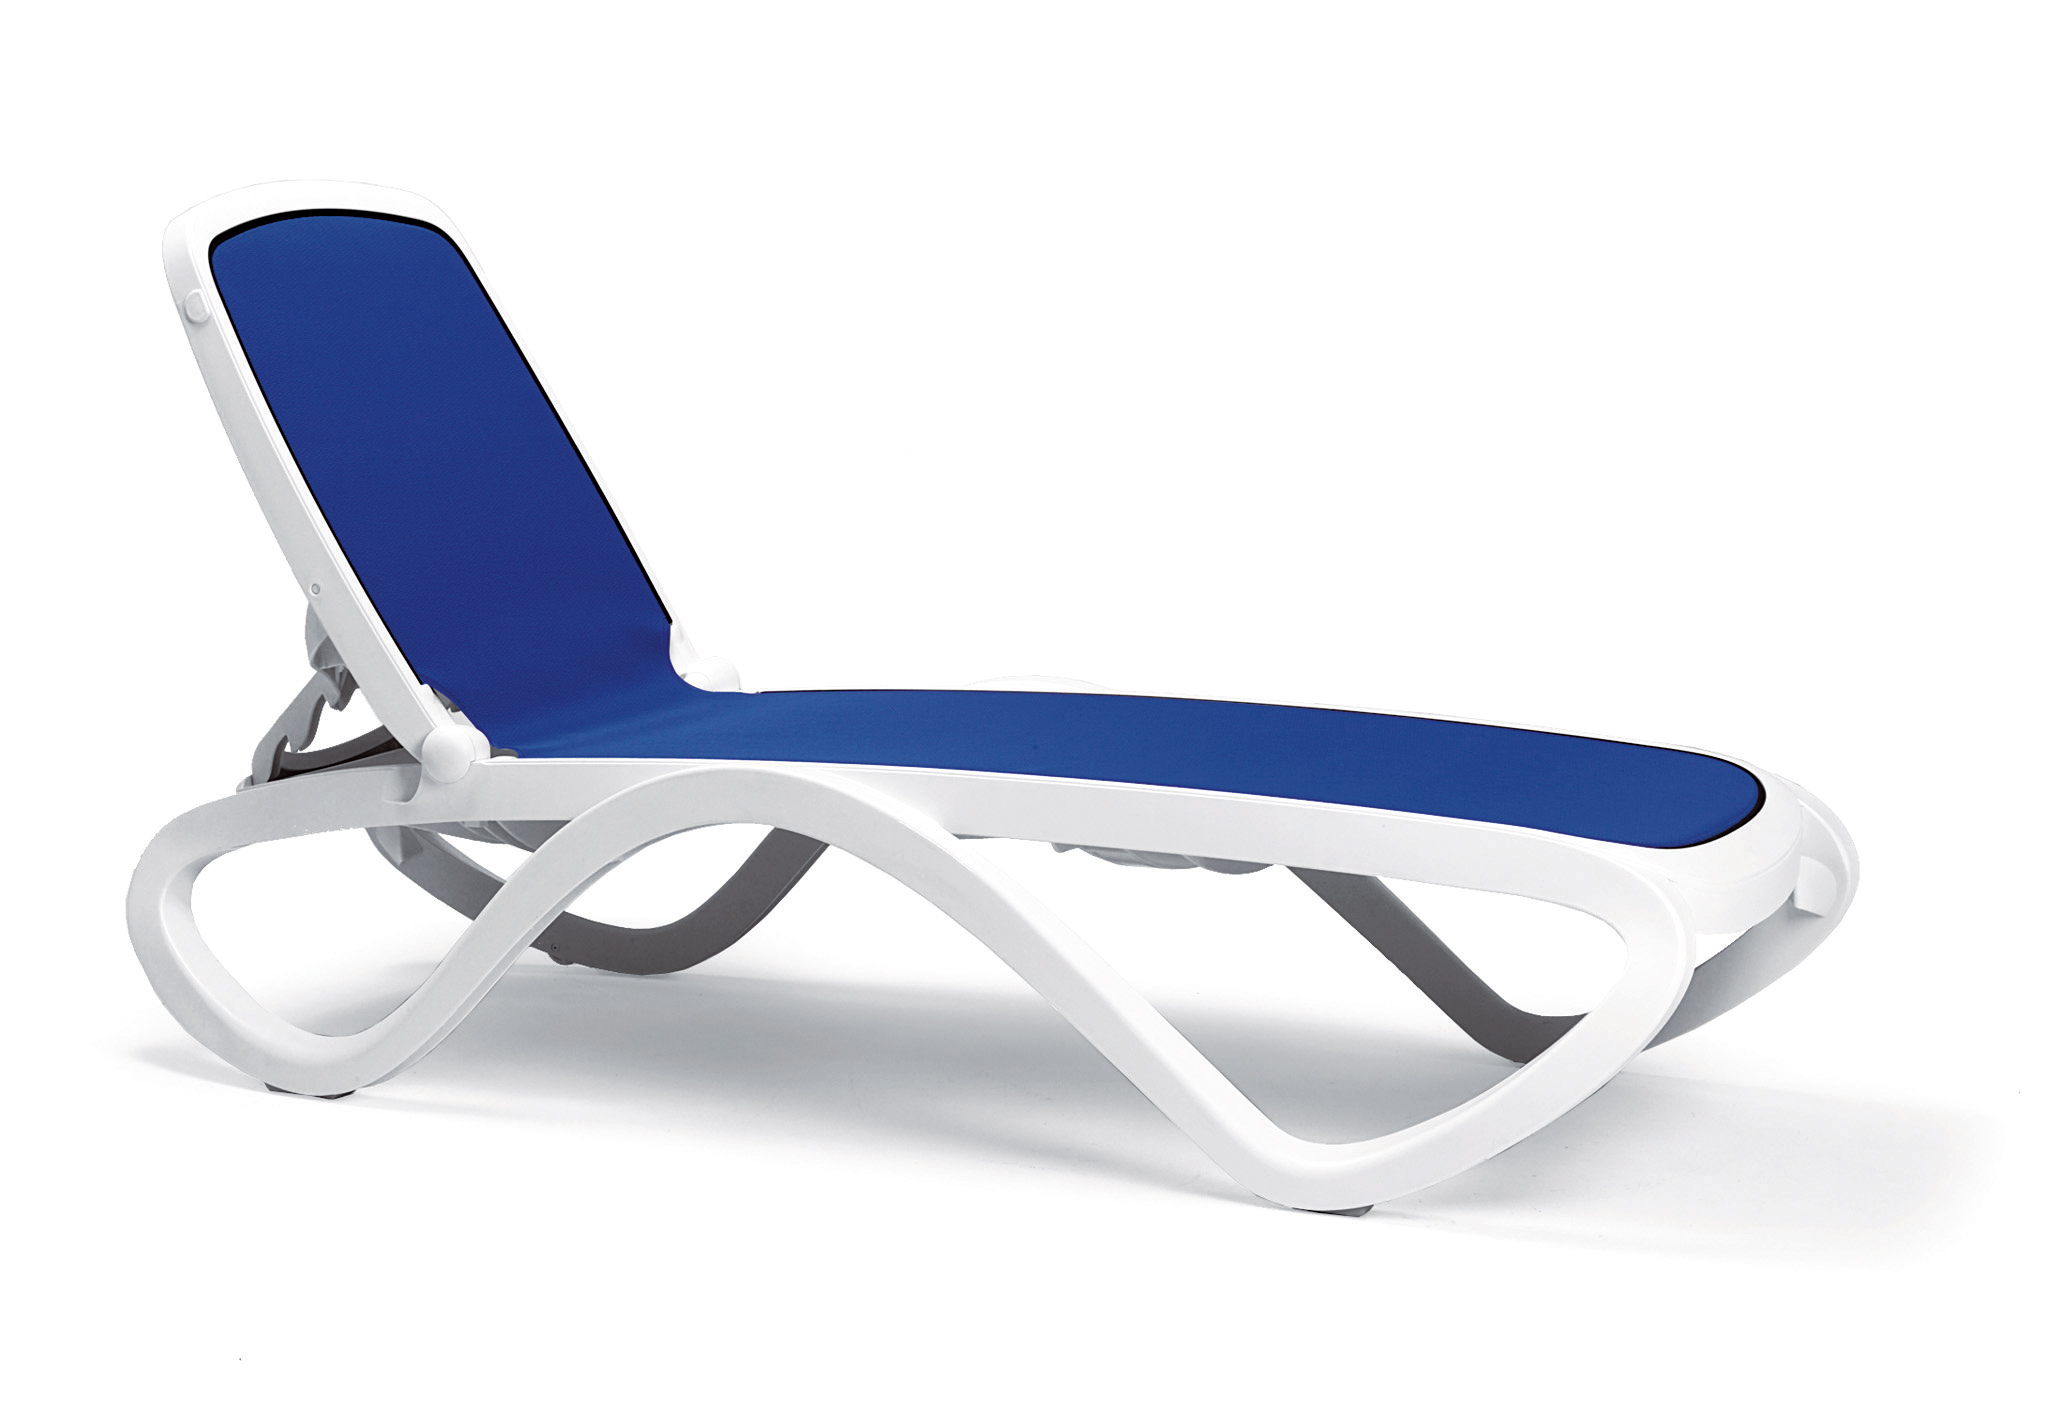 leżak na basen biało niebieski omega nardi